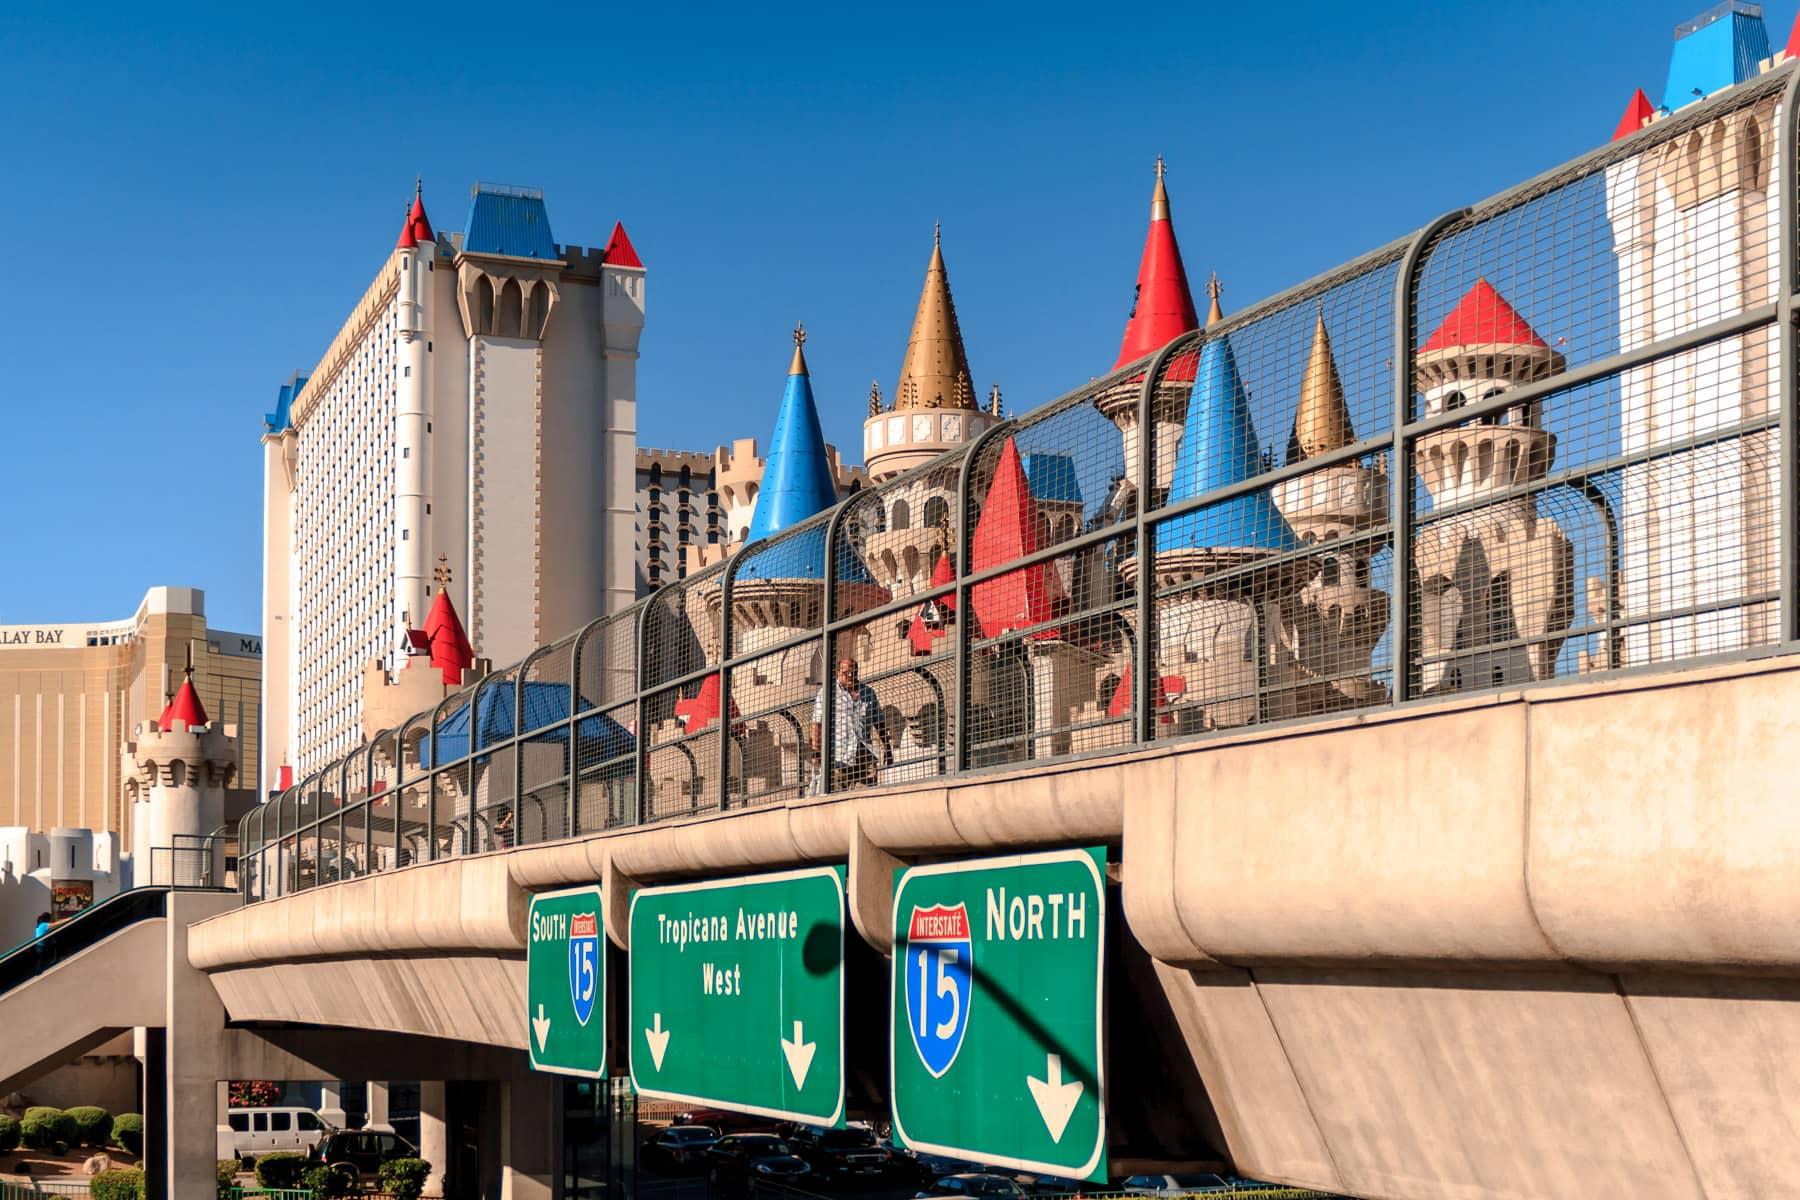 A pedestrian bridge over Las Vegas' Tropicana Avenue, connecting New York New York with the Excalibur.